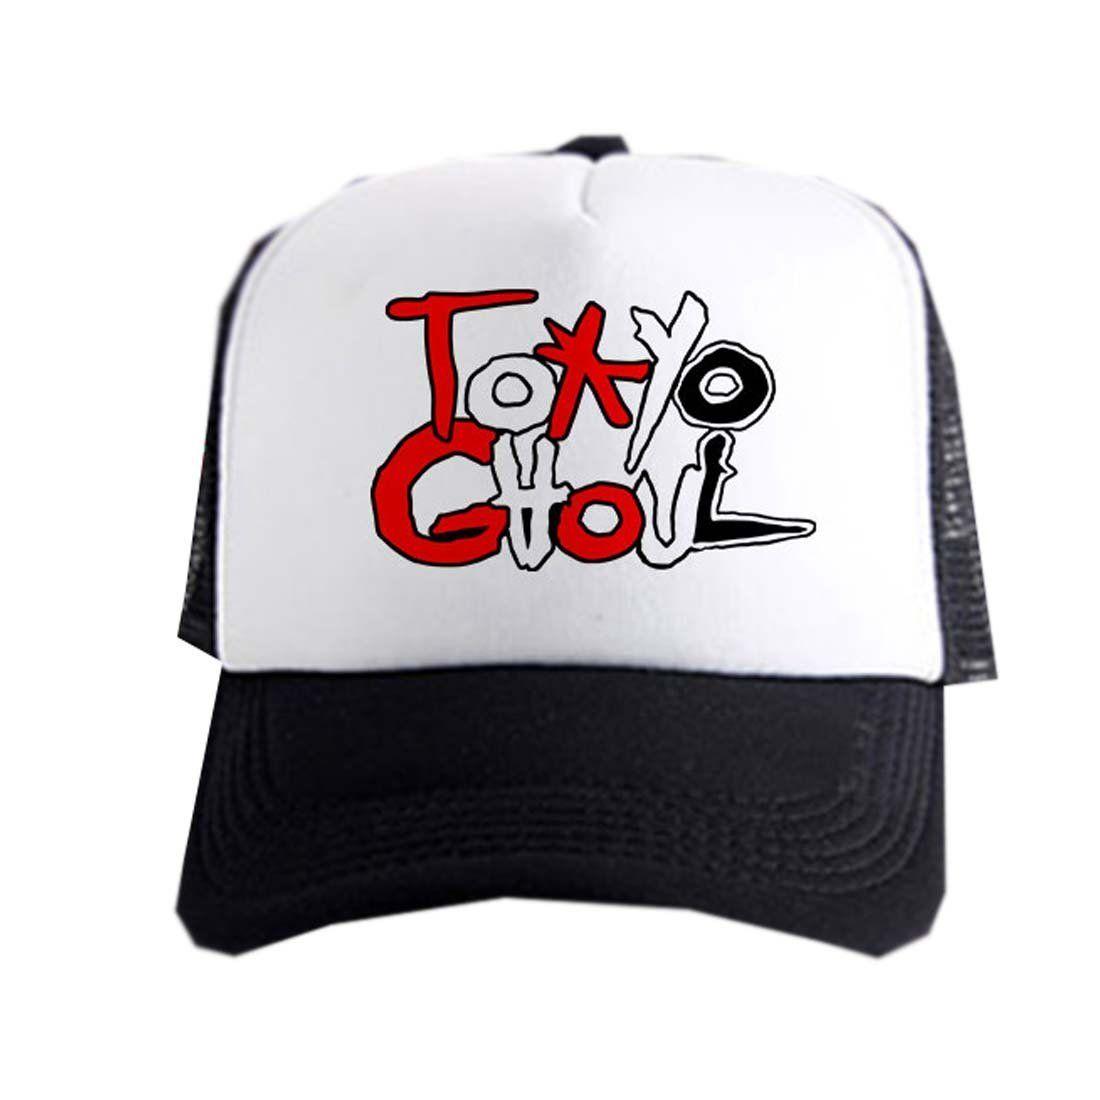 Online Buy Wholesale tokyo cap from China tokyo cap Wholesalers ...